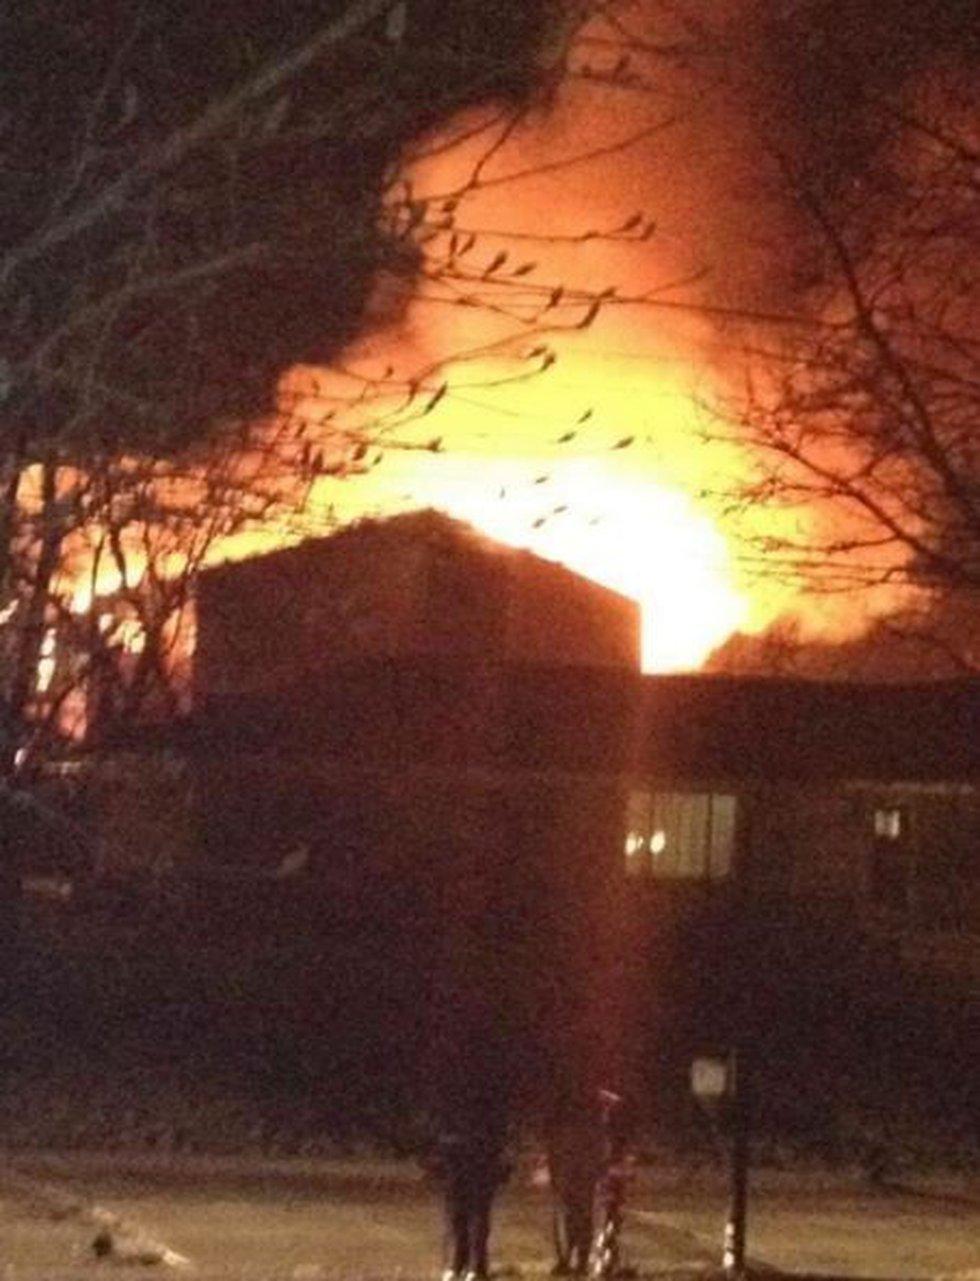 Fire crews are battling a large blaze in Brunswick. (Source: Viewer)